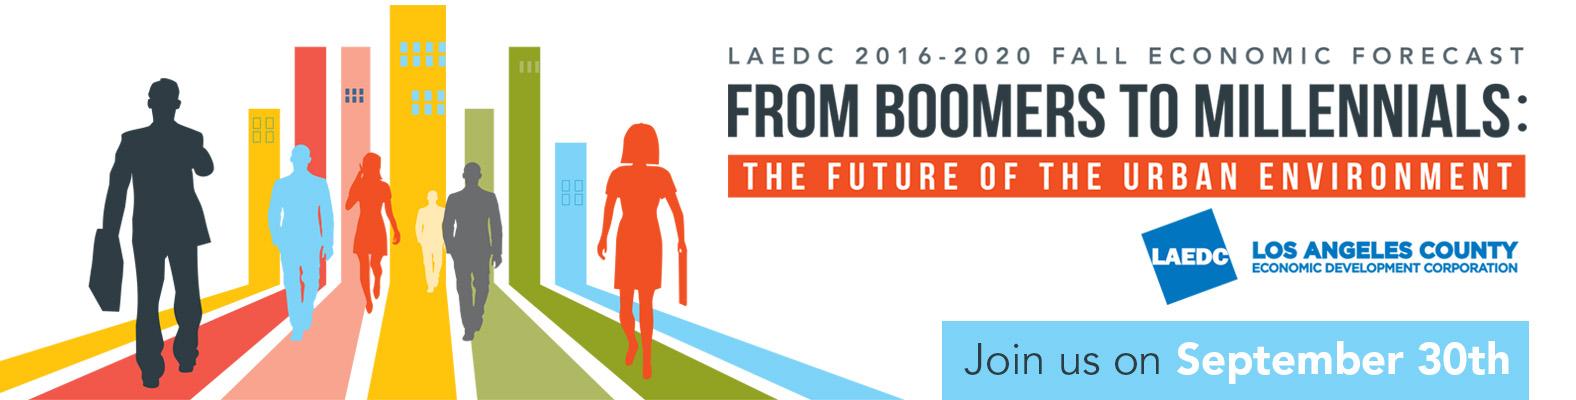 LAEDC-Forecast-Slider